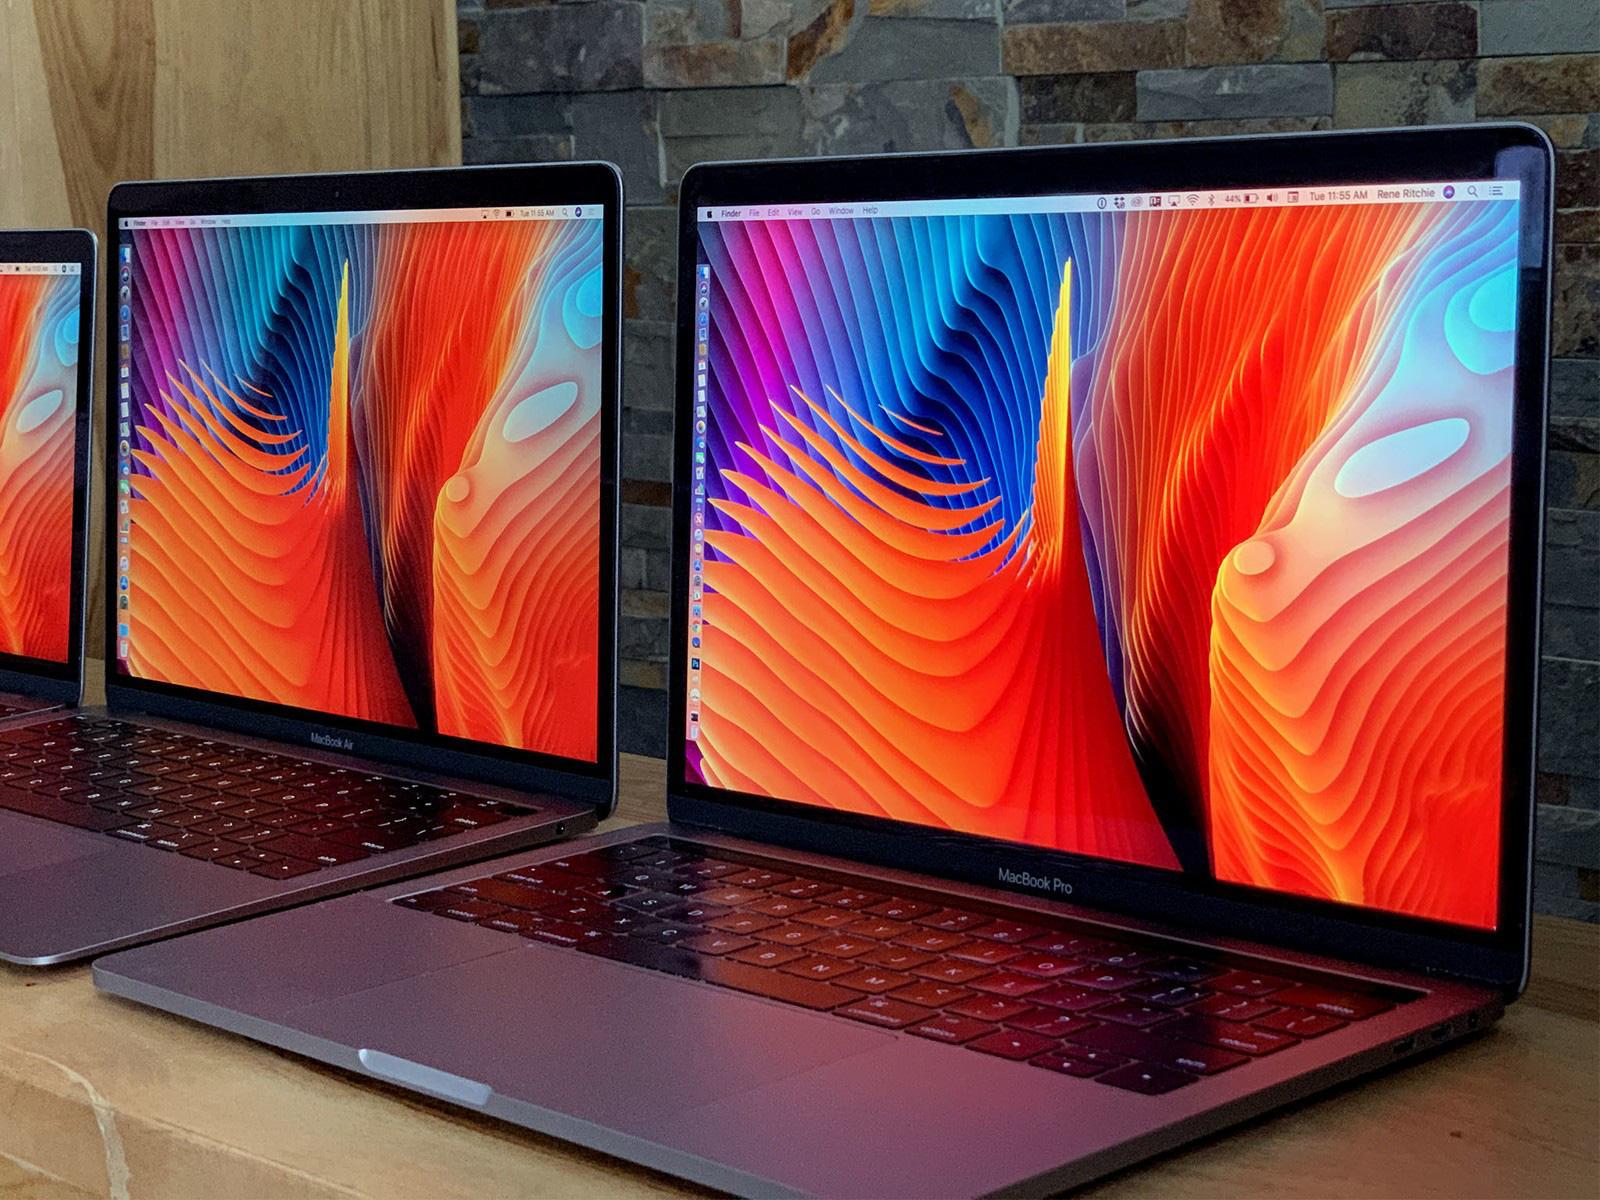 Laptop-giam-gia-tuan-nay-Macbook-duoc-giam-gia-nhieu-hon-Windows thumb